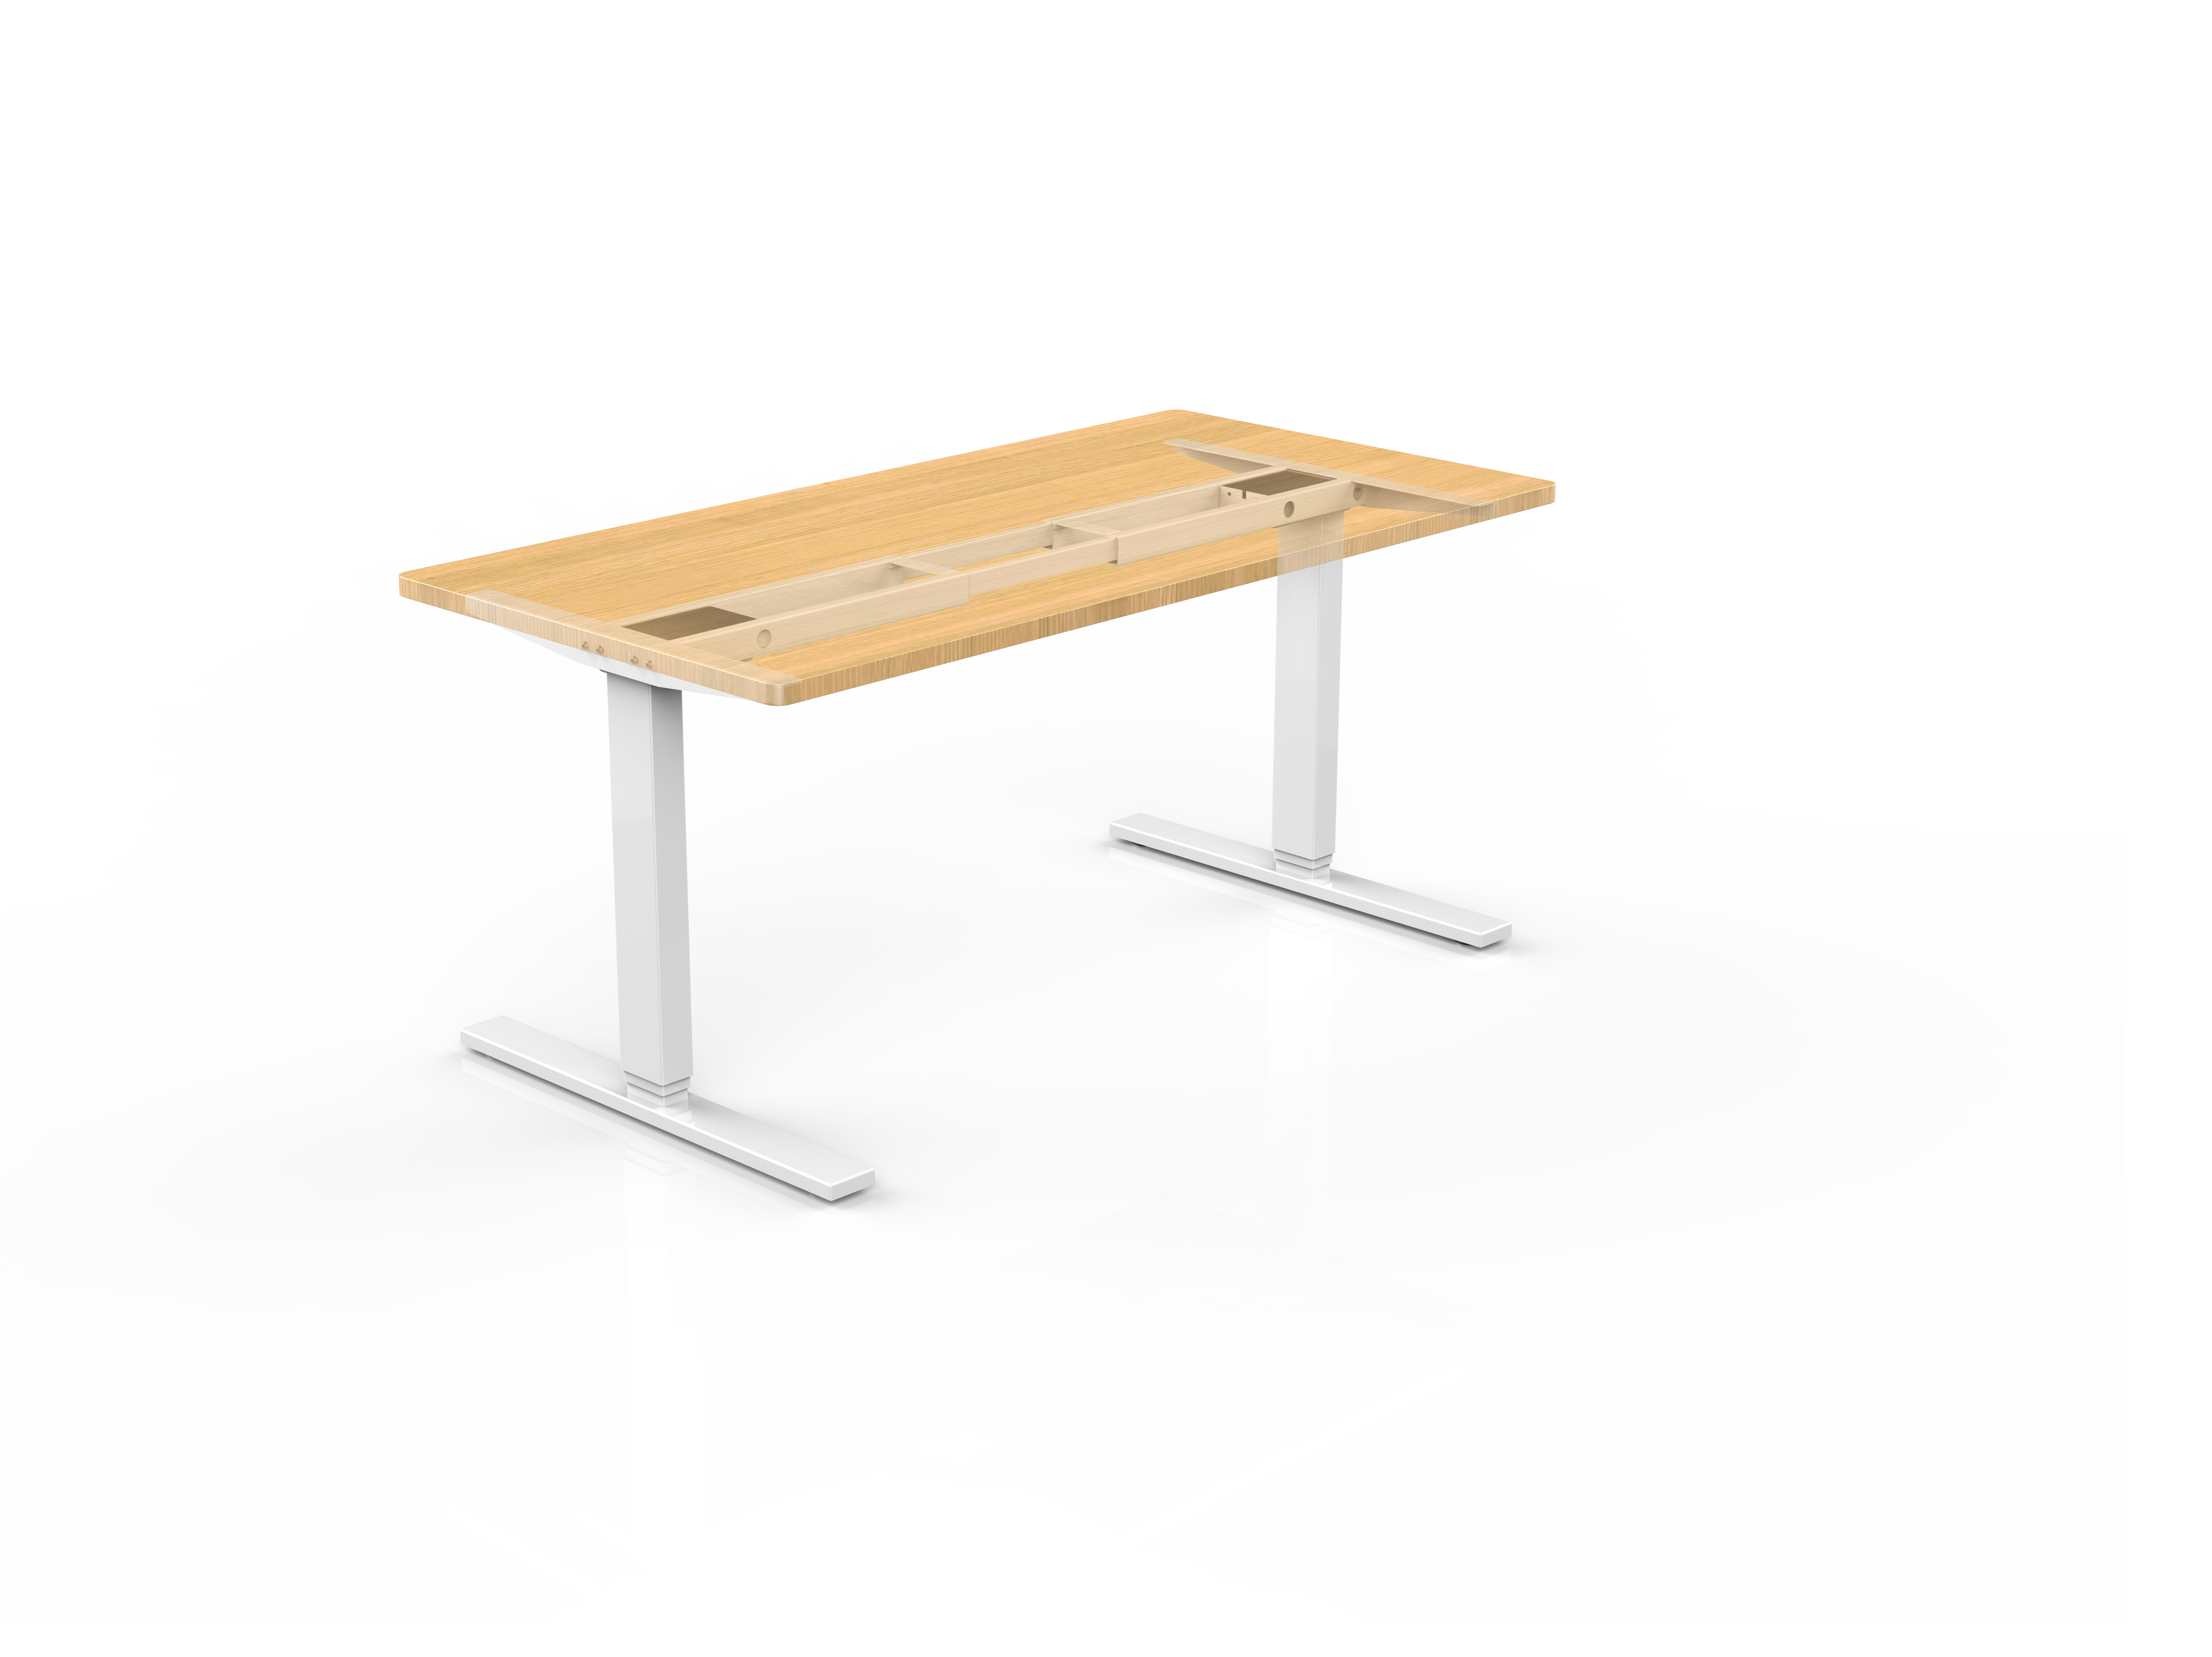 sit stand desk bh-23rr